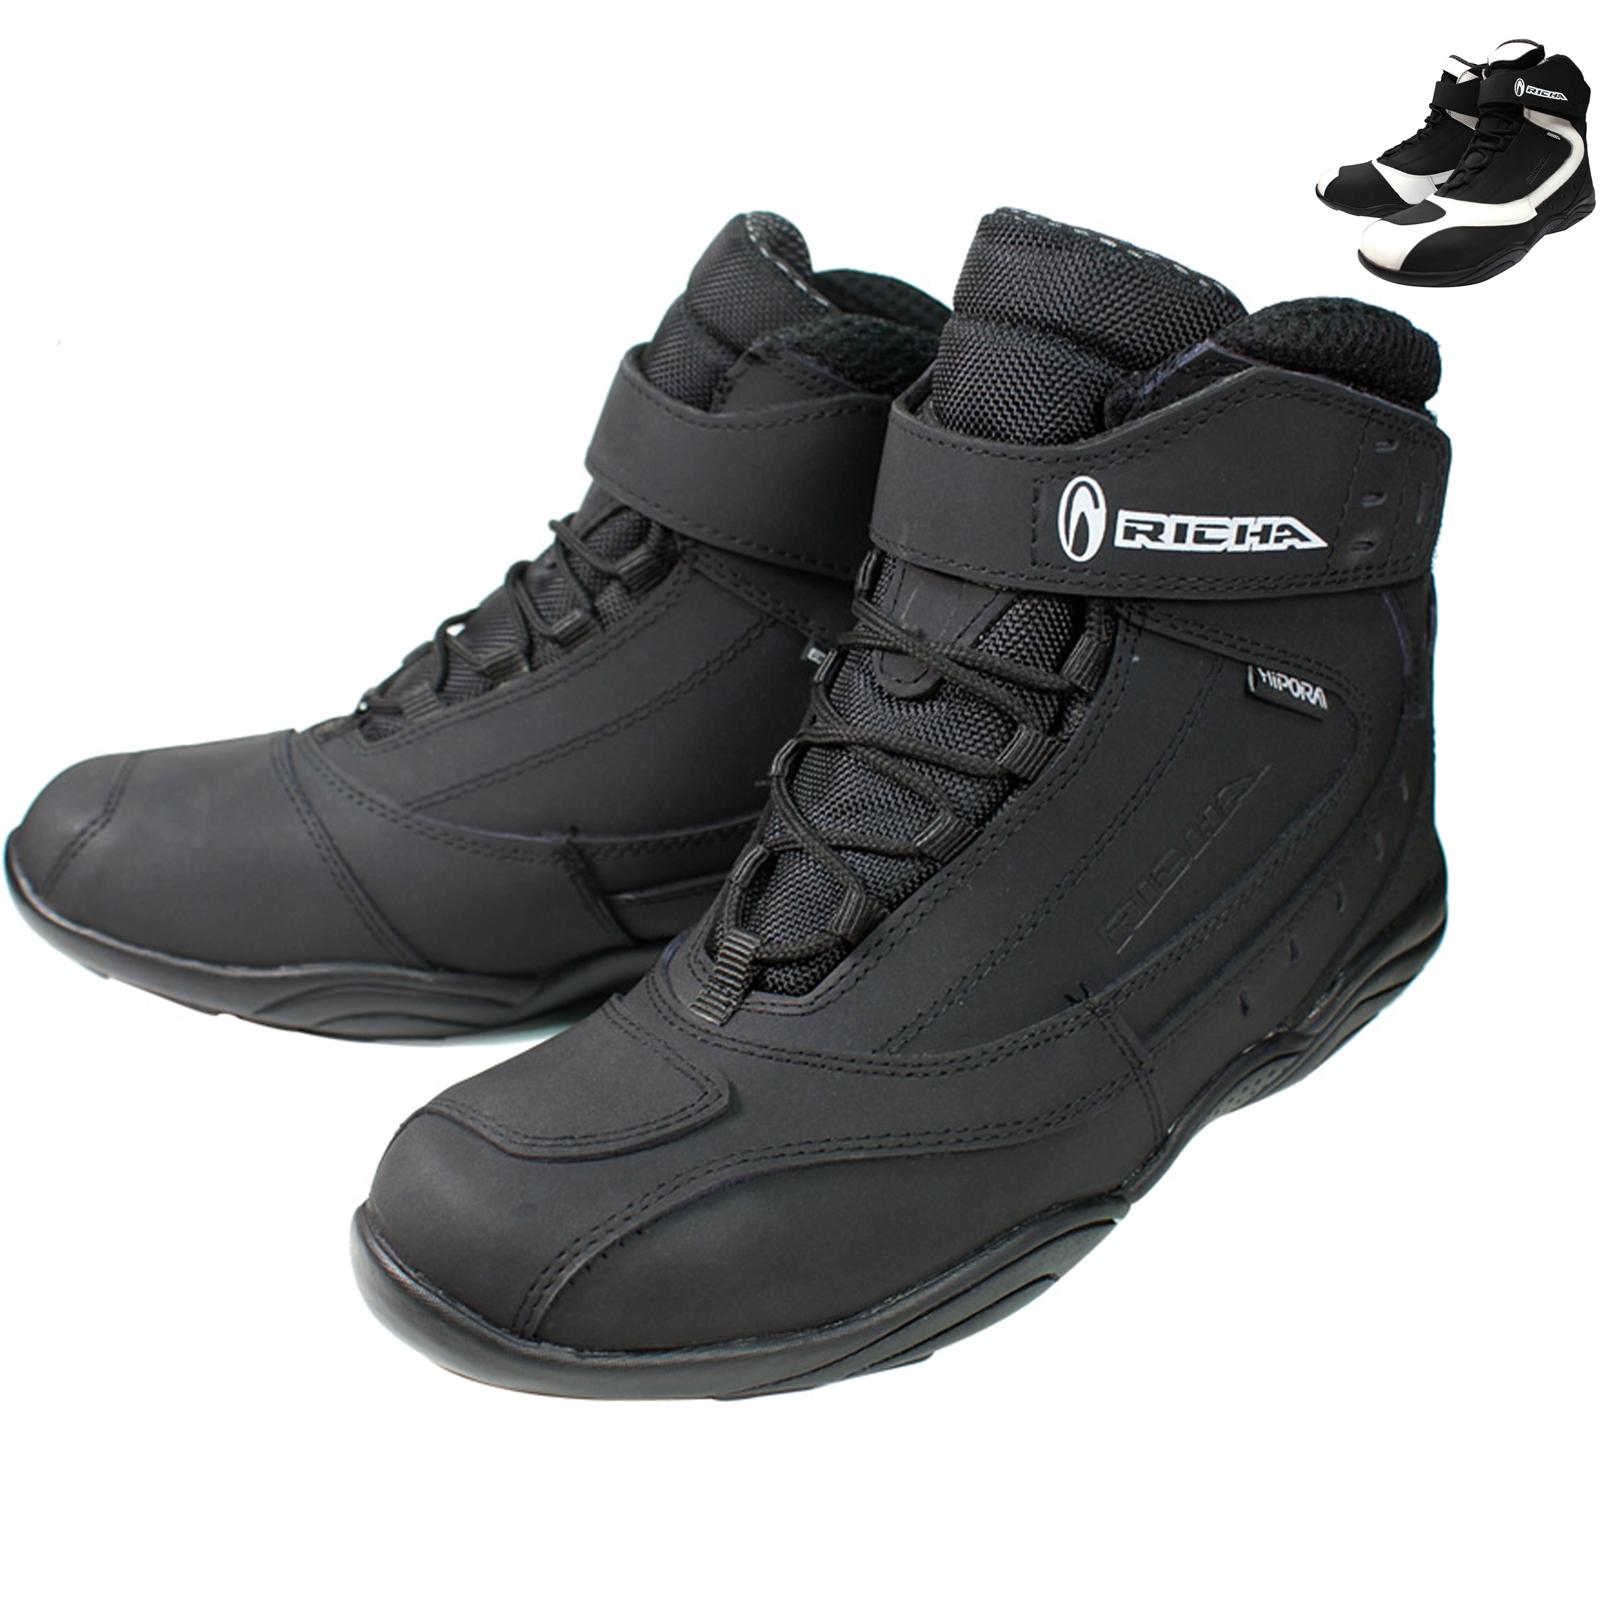 Richa Slick Waterproof Ankle Boots